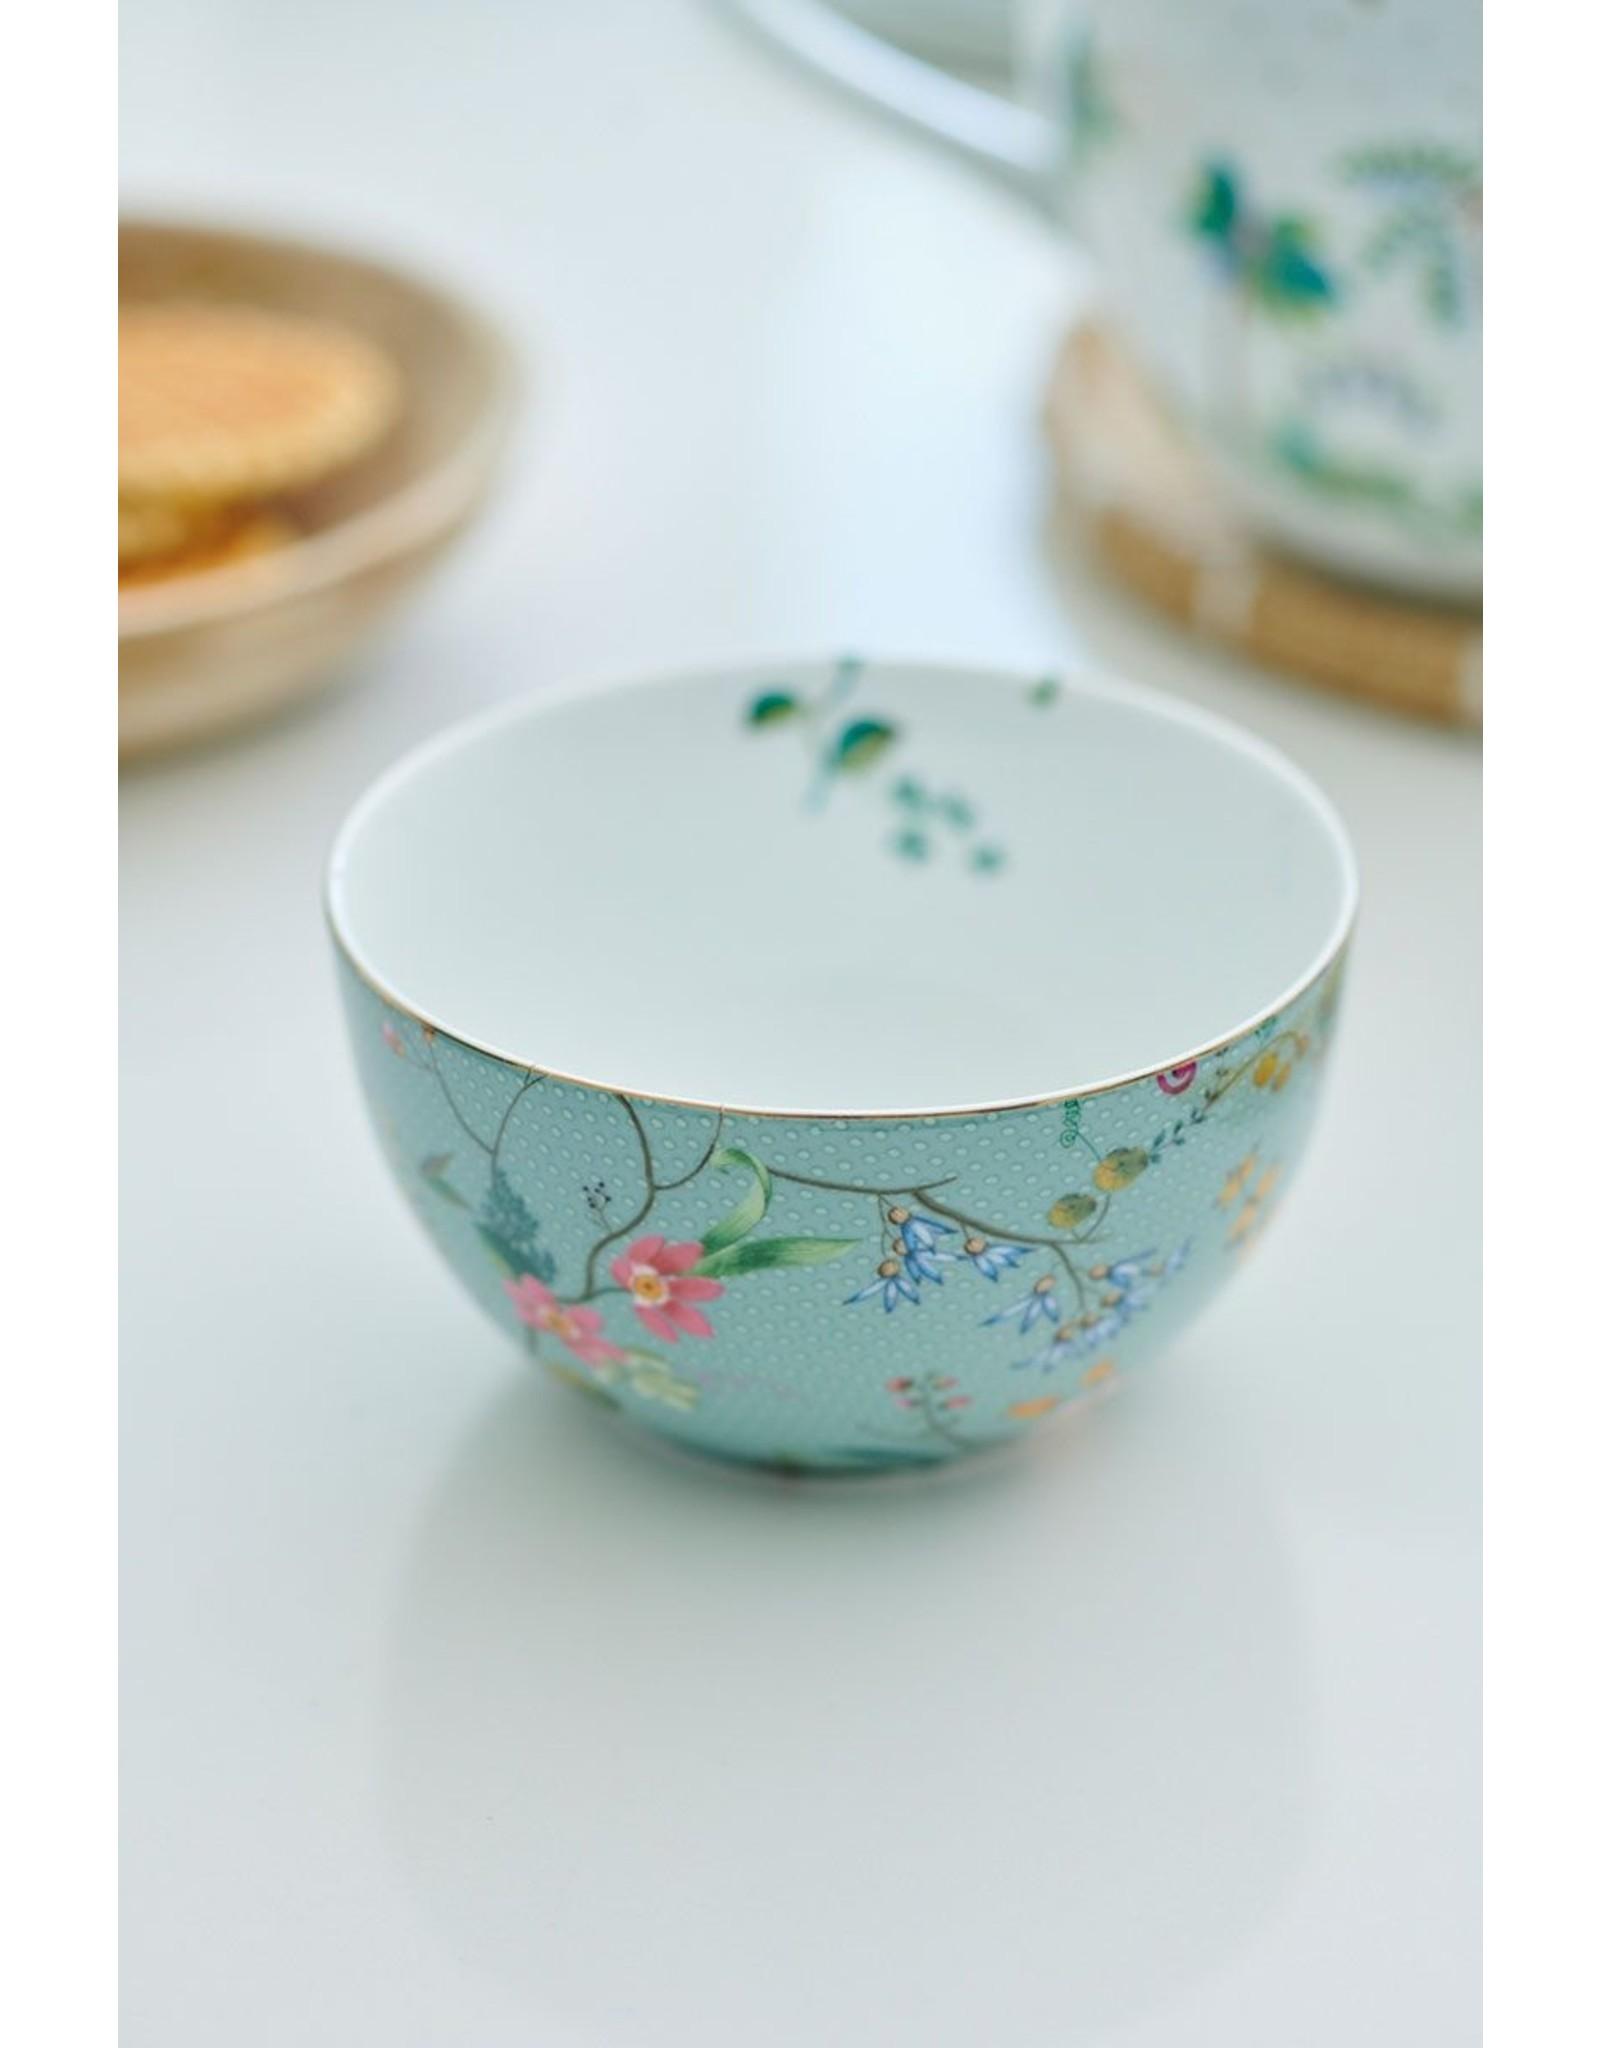 pip-studio Pip-Studio. Bowl Jolie Flowers Blue 12cm